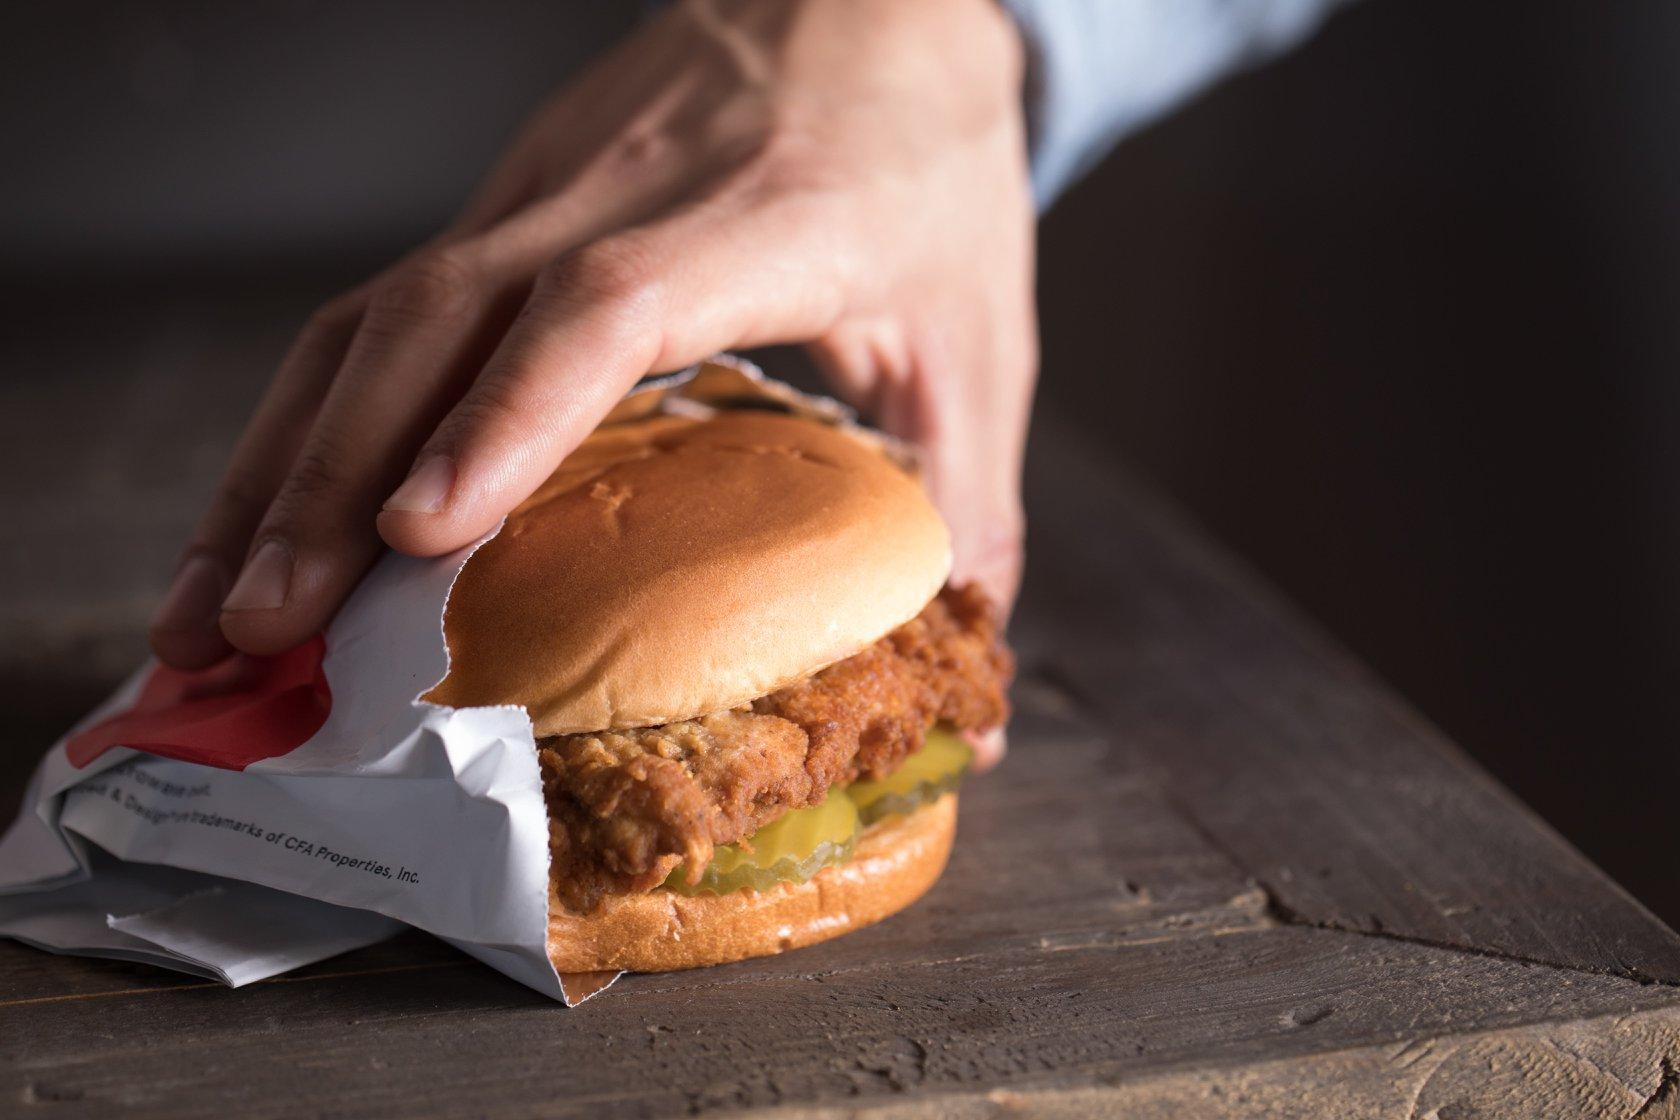 A hand grabbing a chicken sandwich